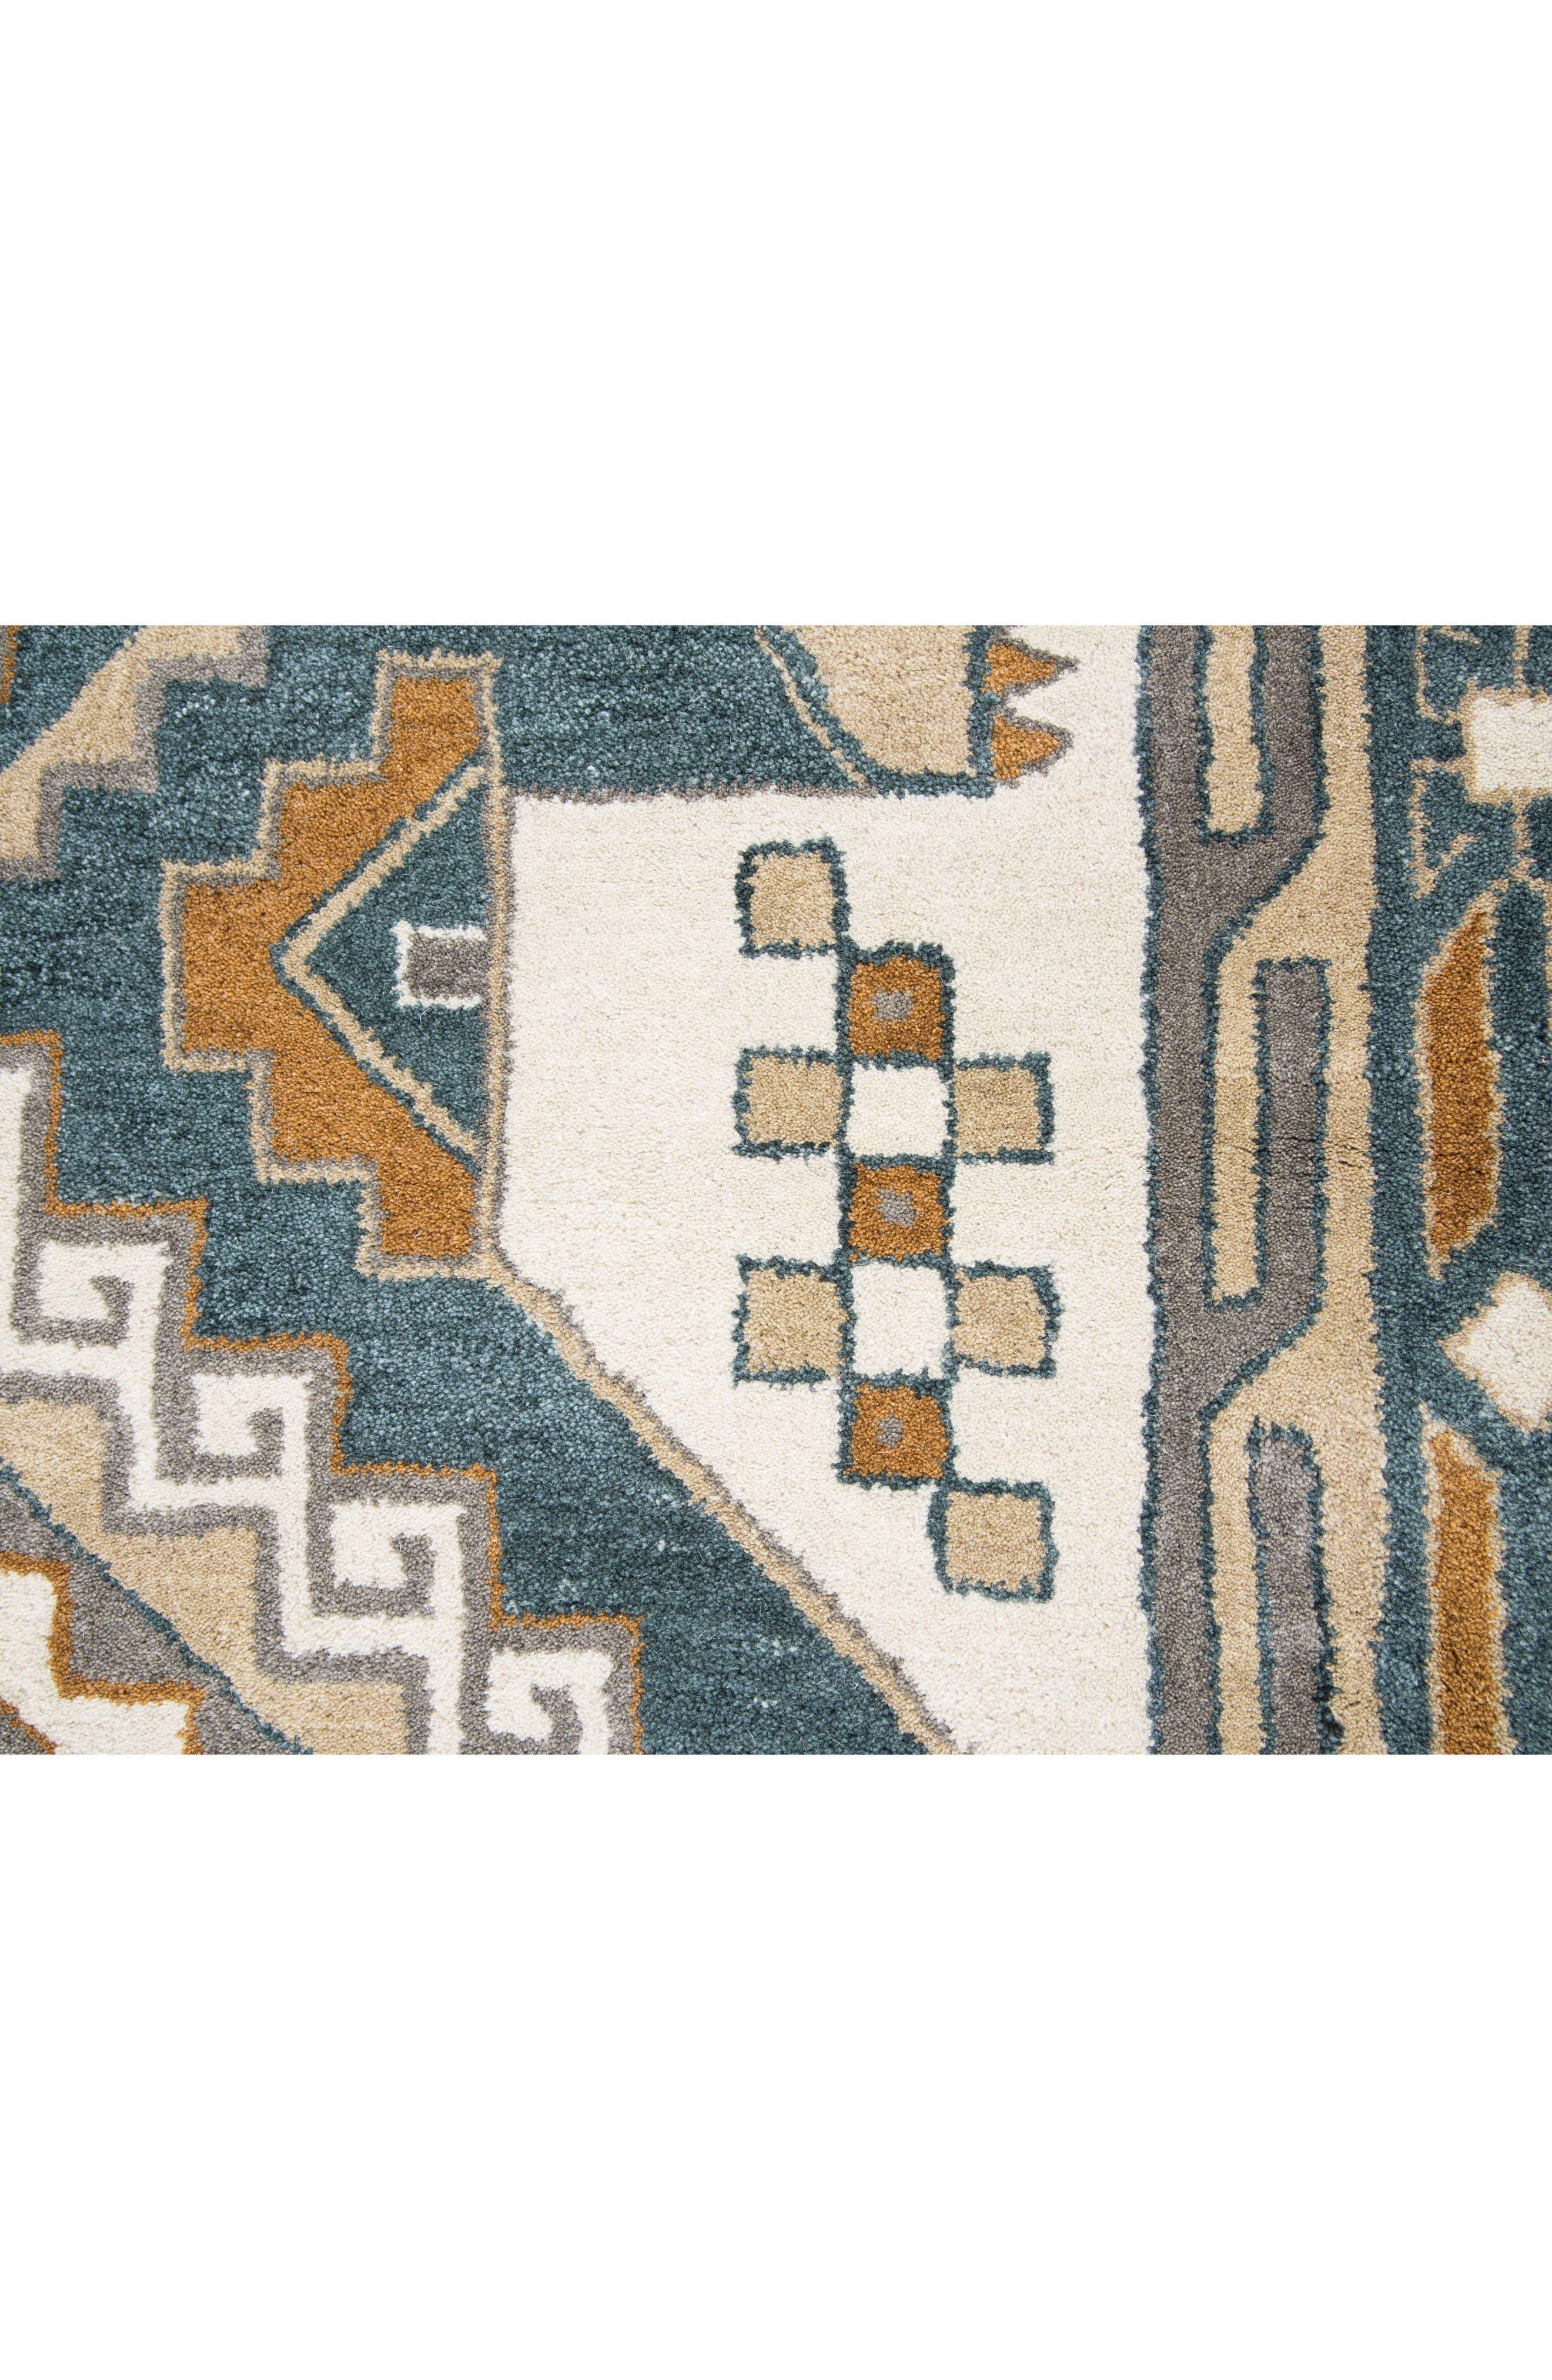 Urban Tiles Hand Tufted Wool Rug,                             Alternate thumbnail 4, color,                             220